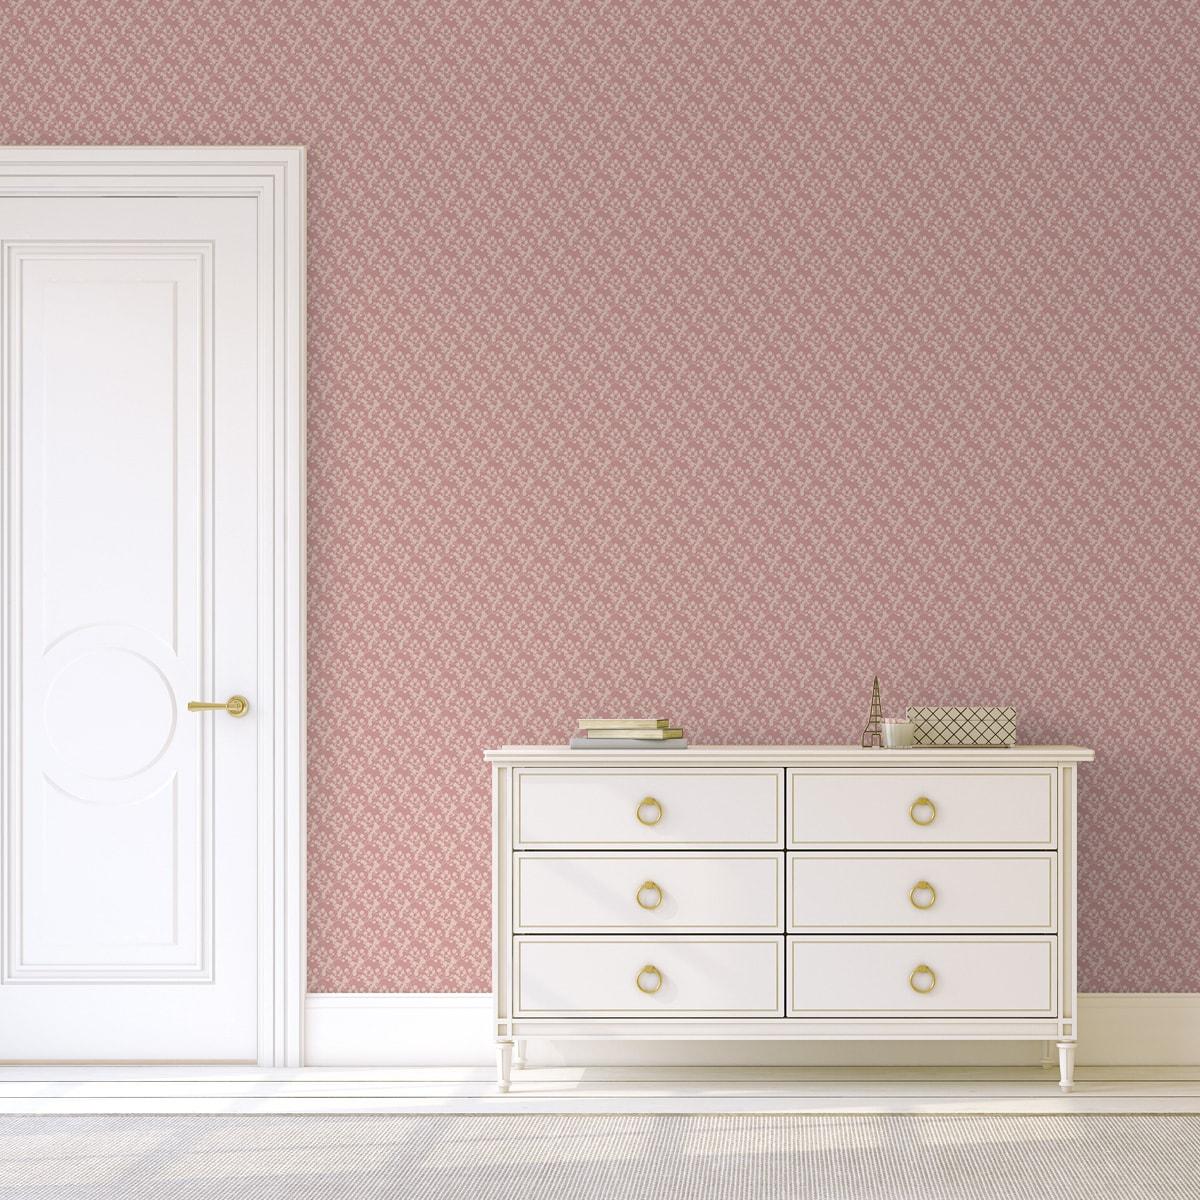 Tapete Wohnzimmer pink: Rosa Tapete